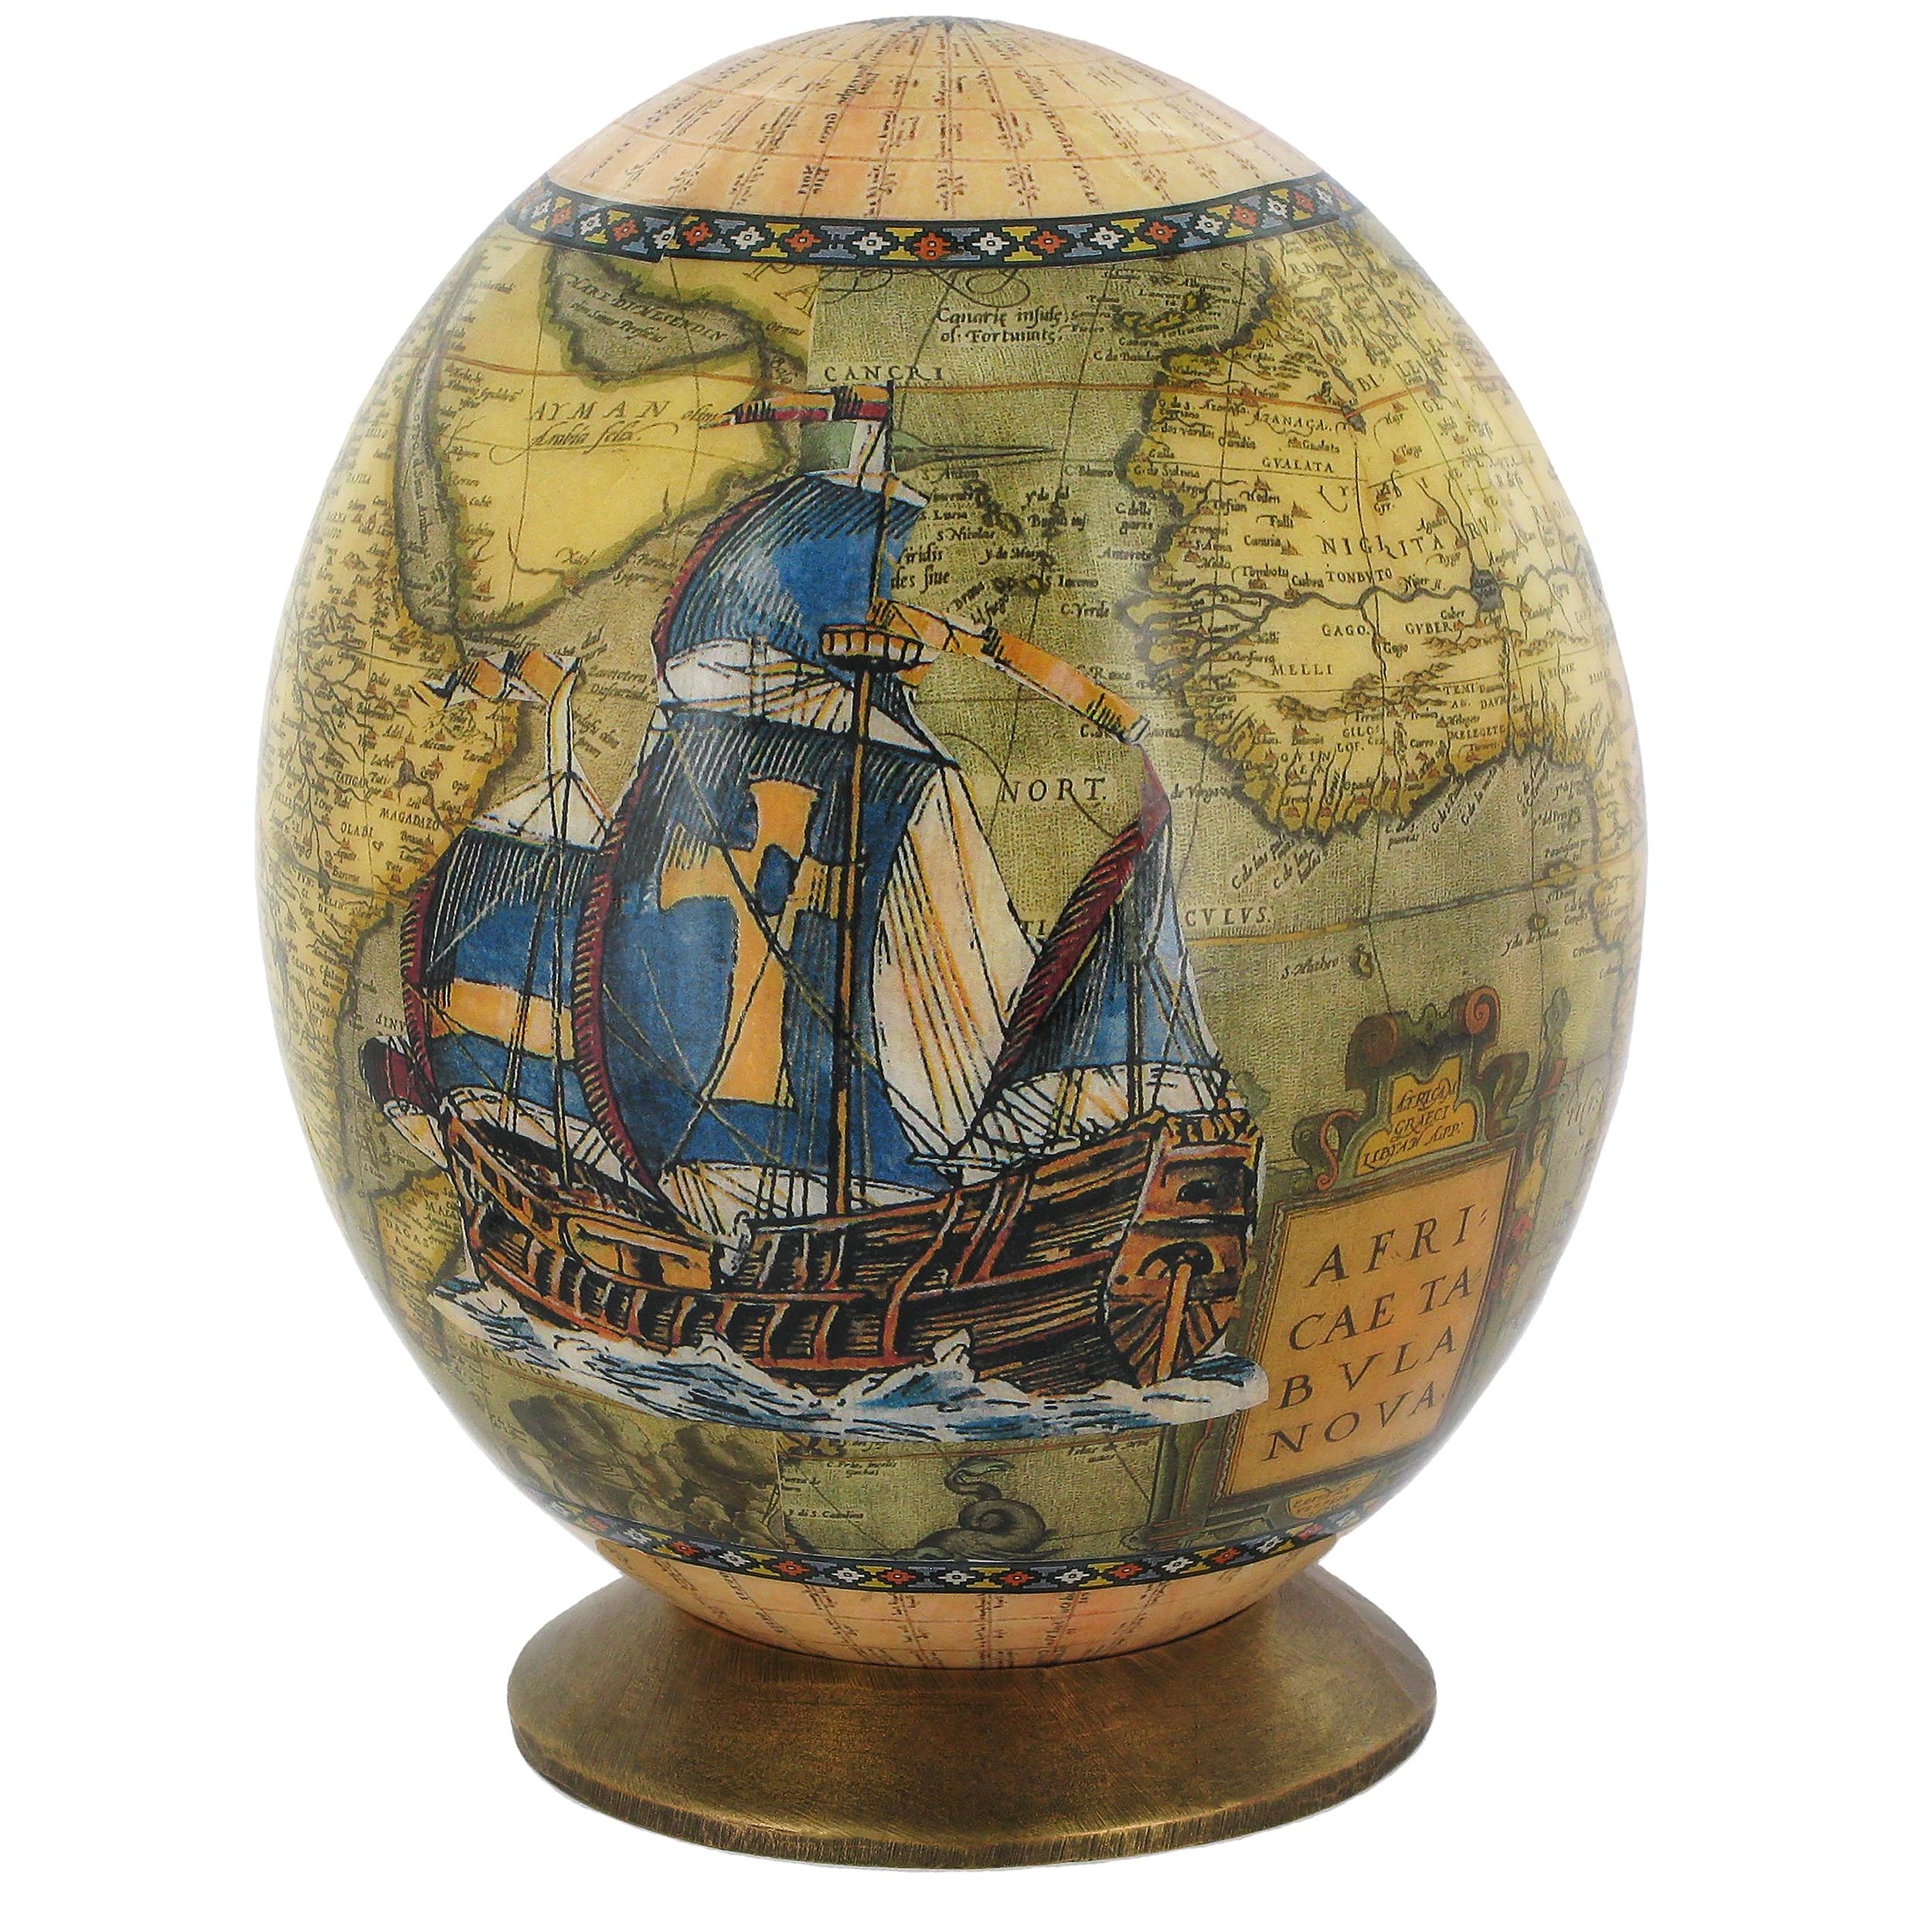 Boat Ostrich egg ornament